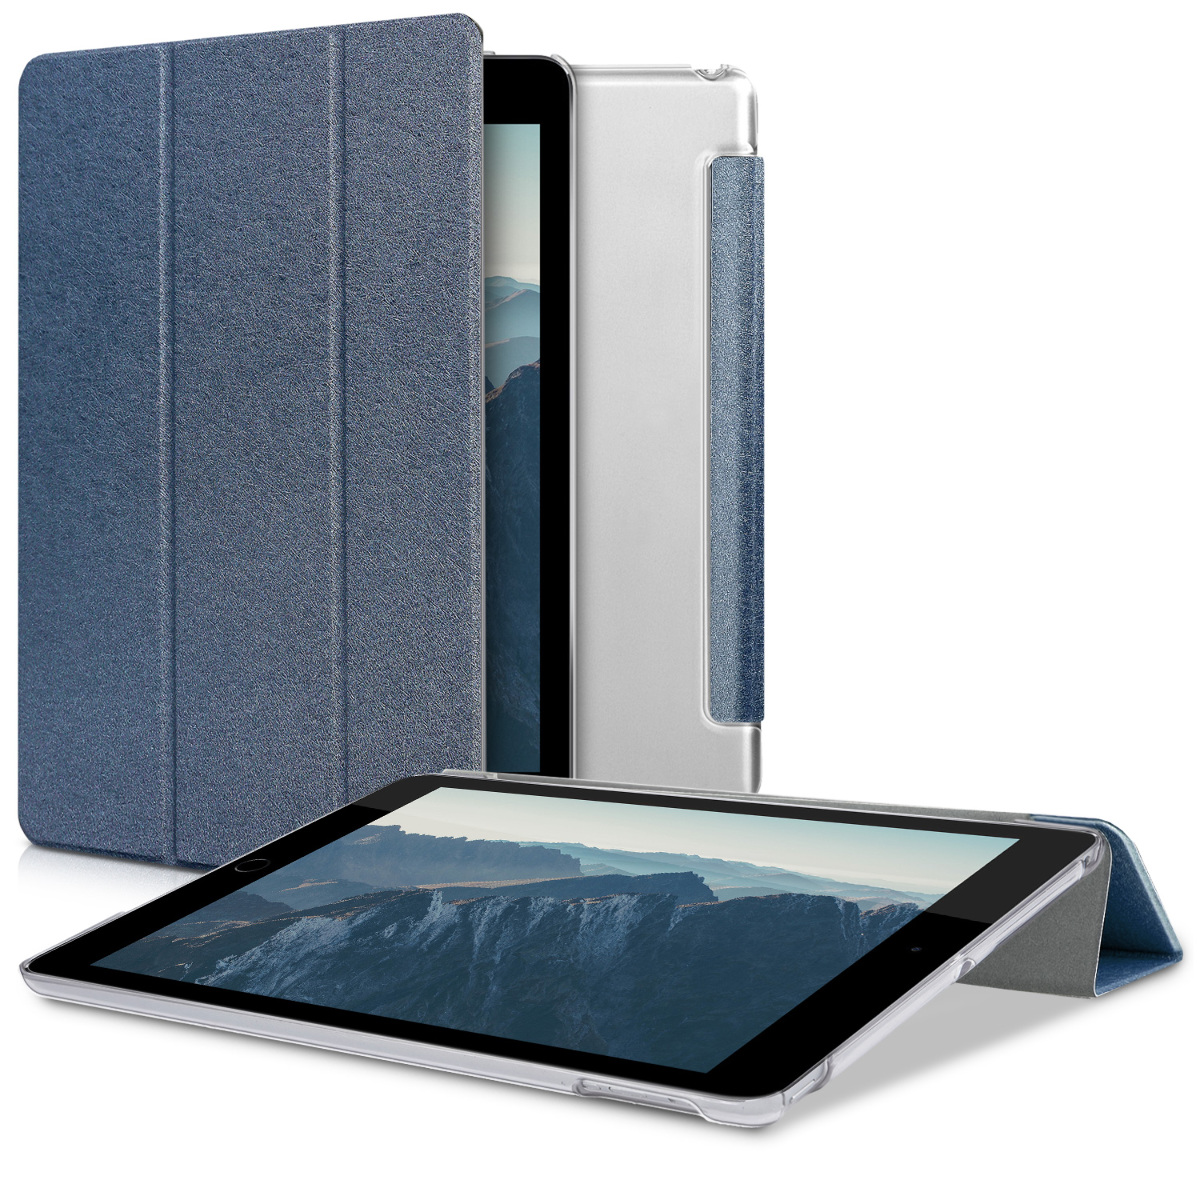 KW Θήκη Slim iPad 9.7'' 2018 / 2017 - Σκούρο μπλε (41509.17)